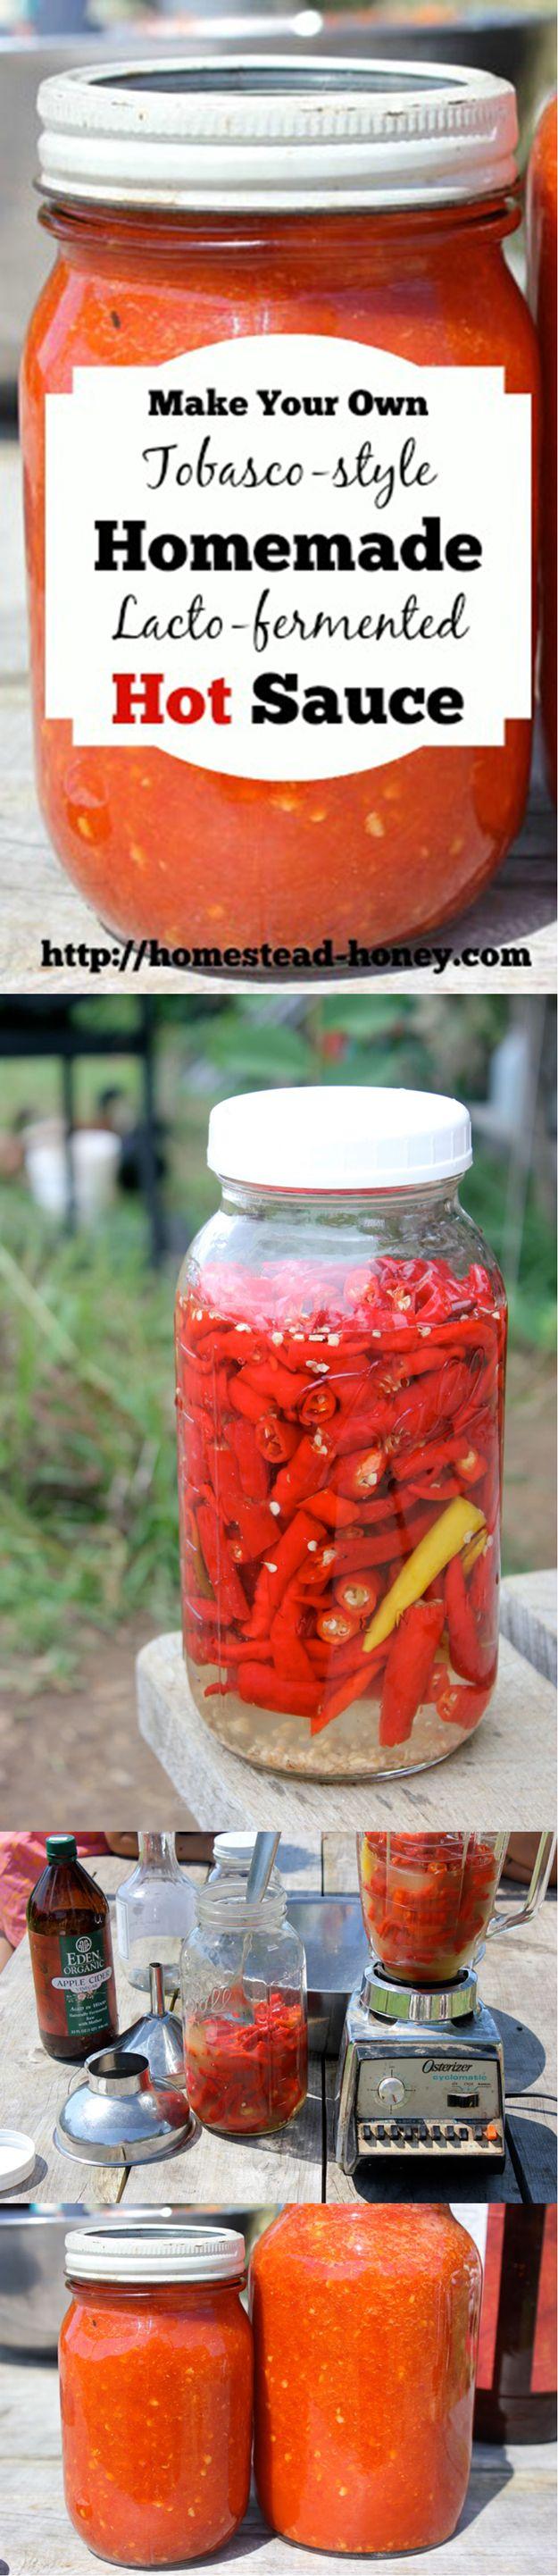 Tobasco-Style Homemade Lacto-Fermented Hot Sauce | Healthy Homemade Hot Sauce Recipe by DIY Ready at  http://diyready.com/top-14-hot-sauce-recipes/